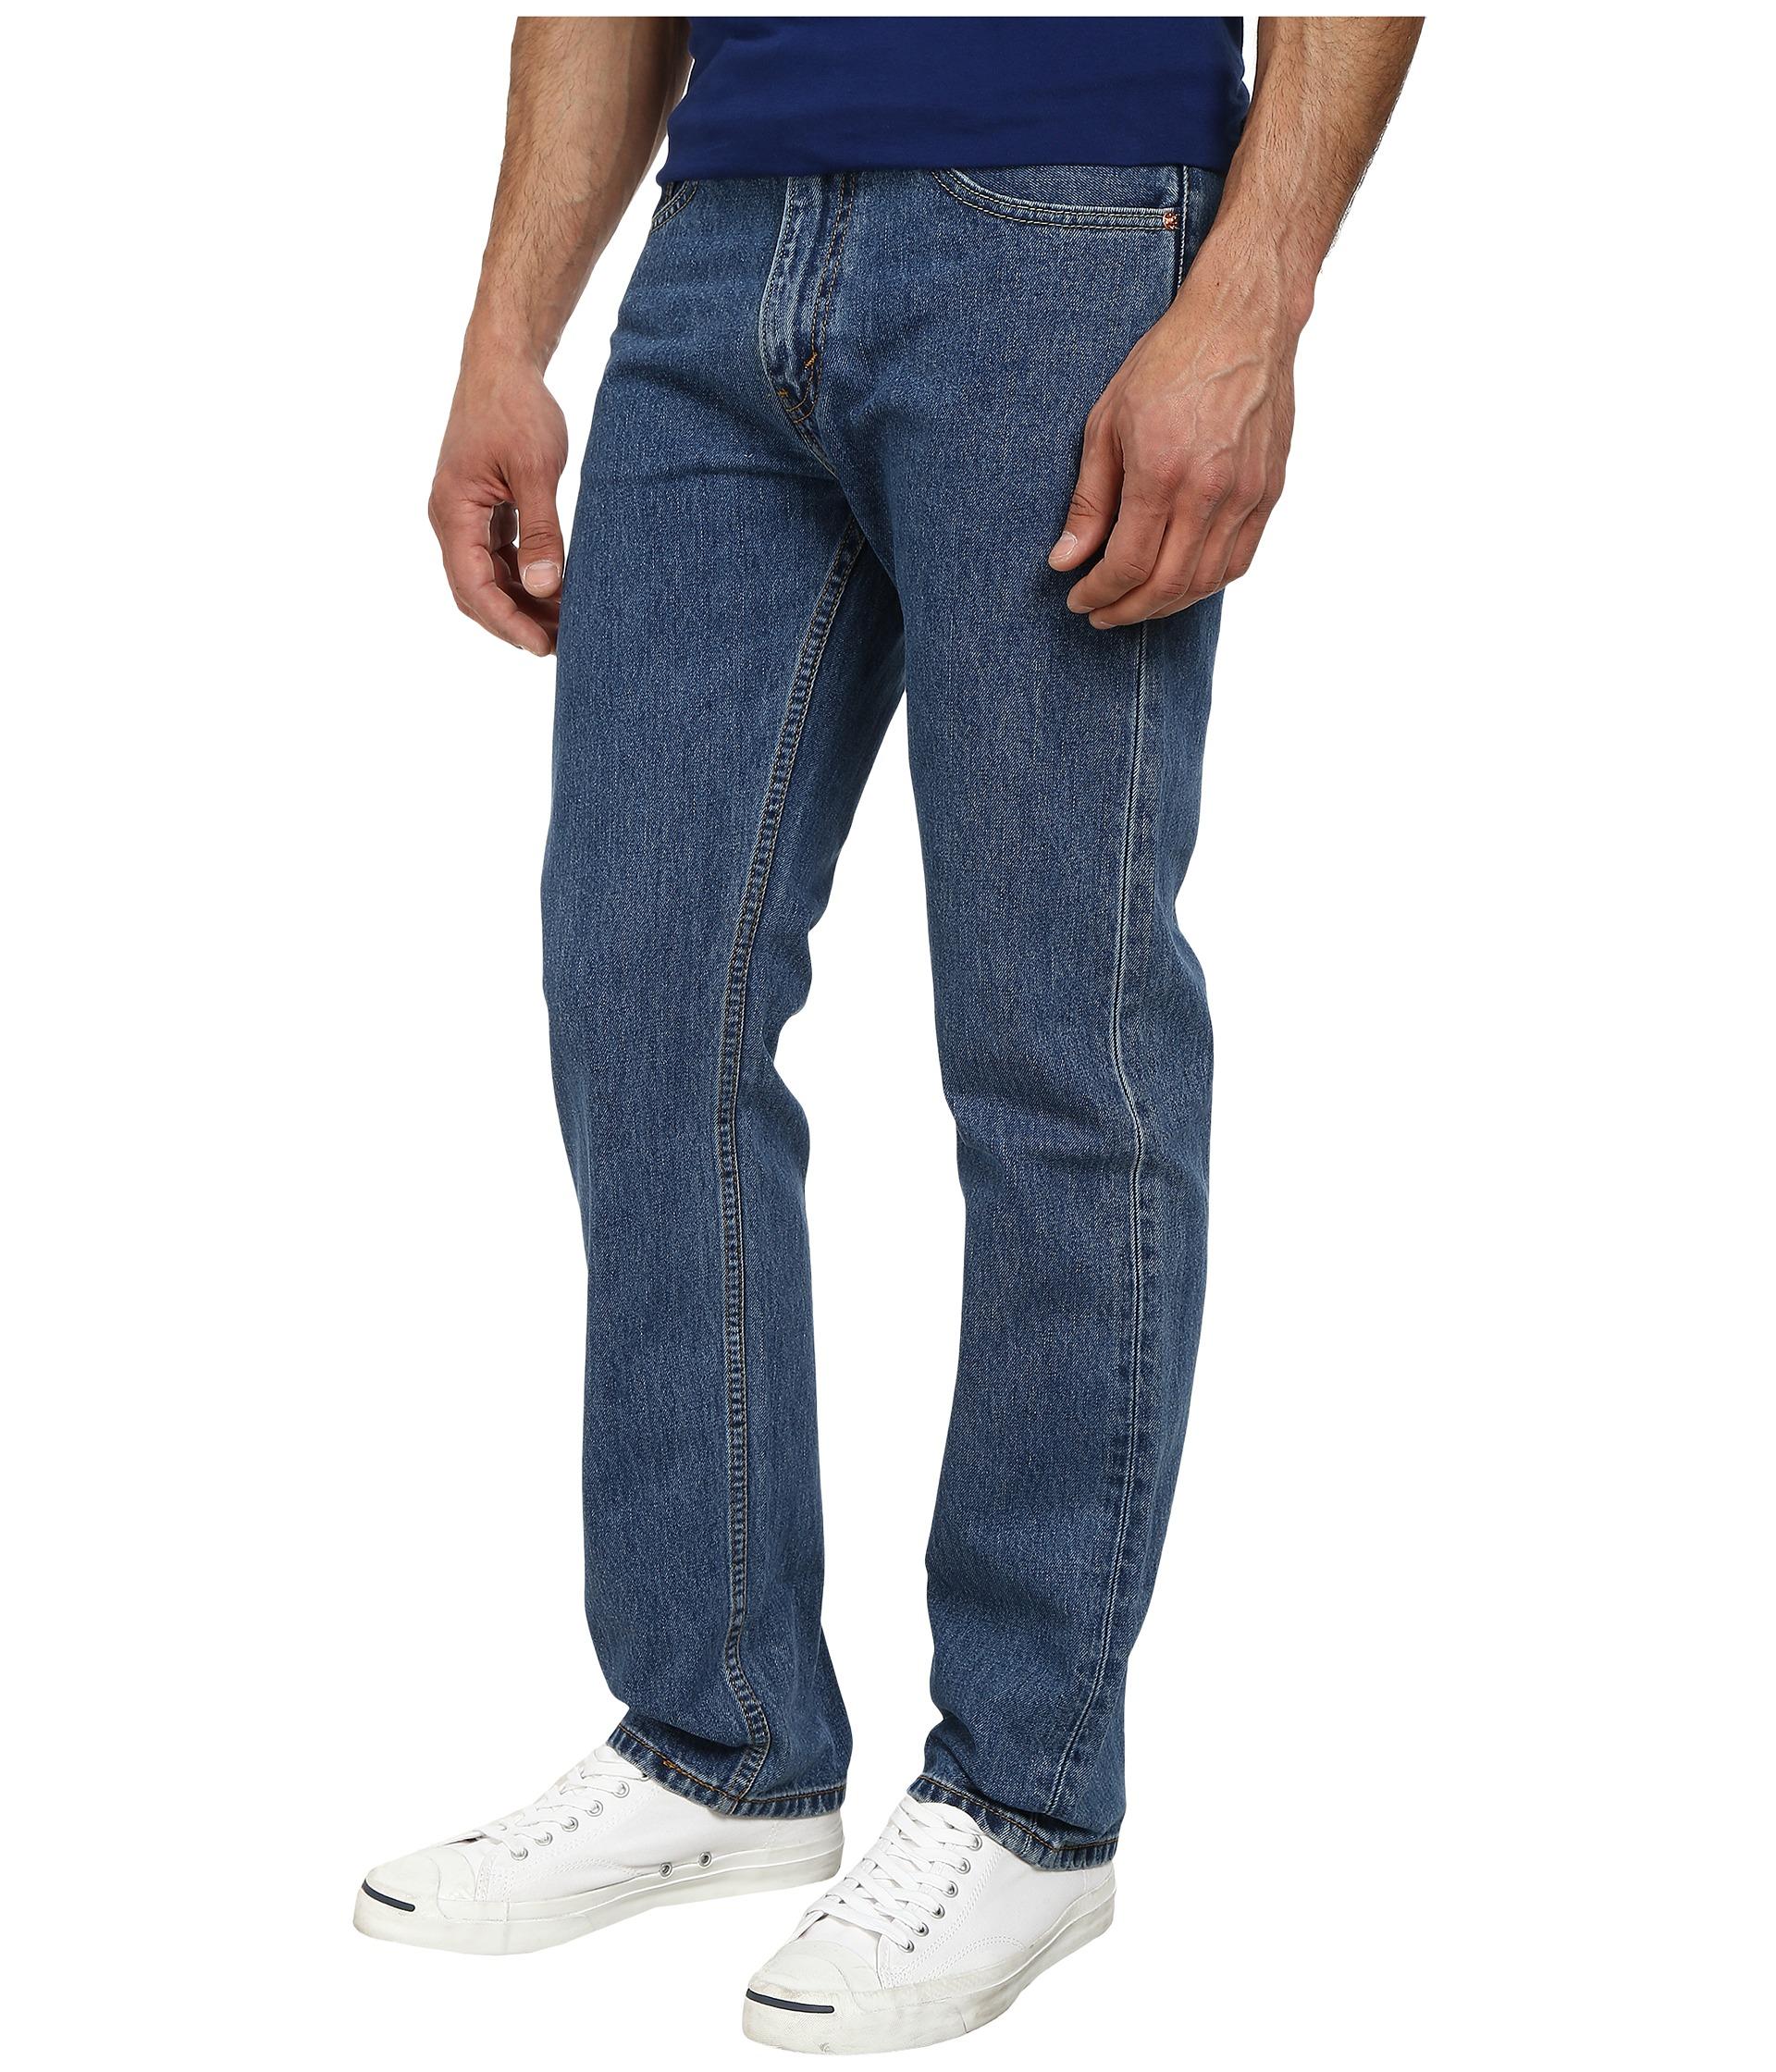 Levis 505 Mens Jeans Images Menswear Mensfashion